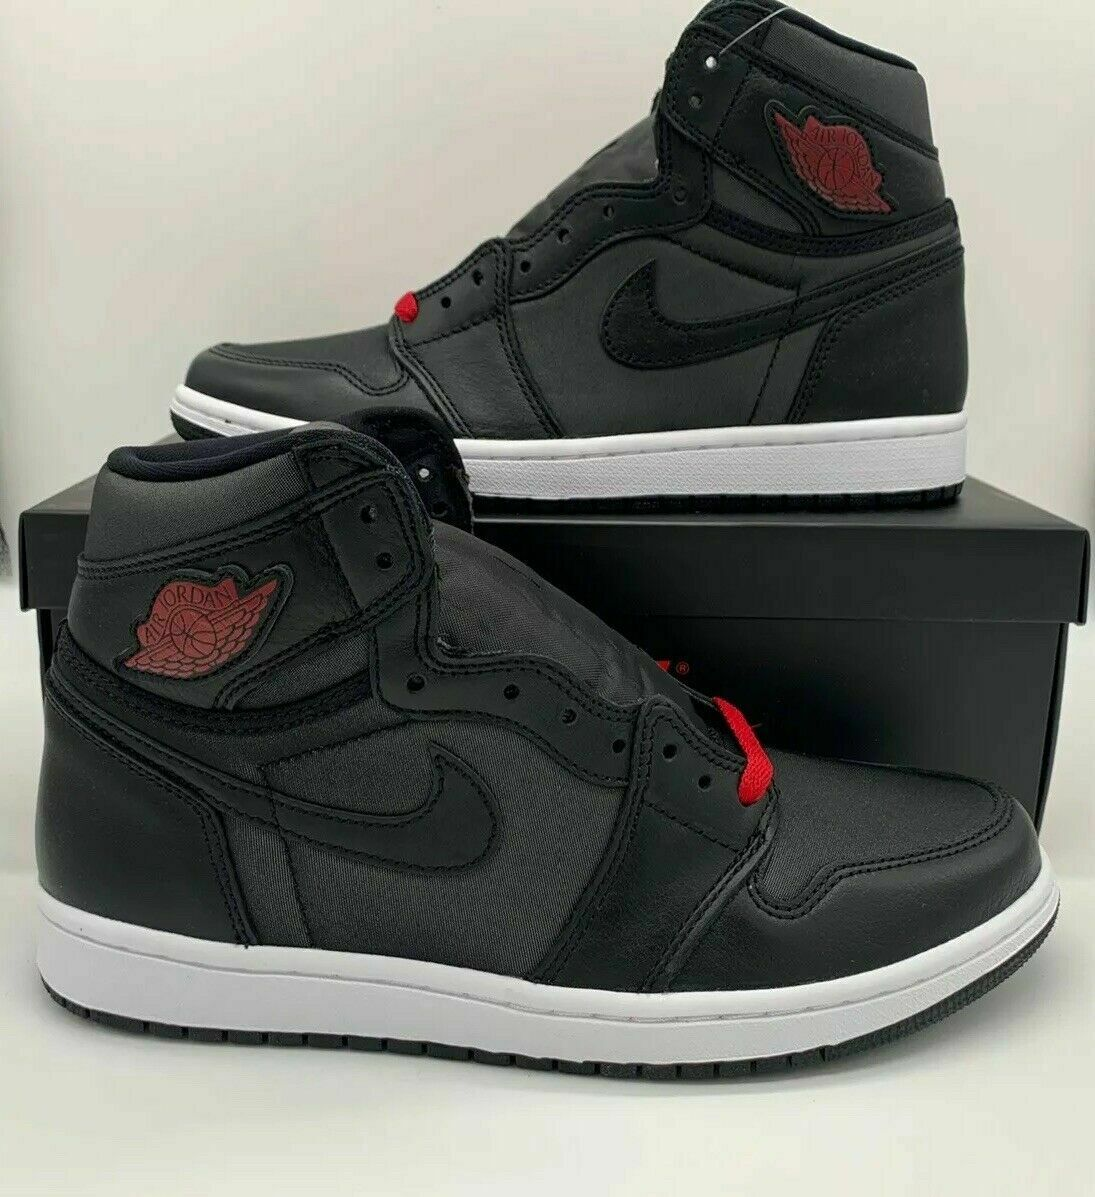 2018 Nike Air Jordan 1 Retro High Og Blue Moon 555088 115 Mens